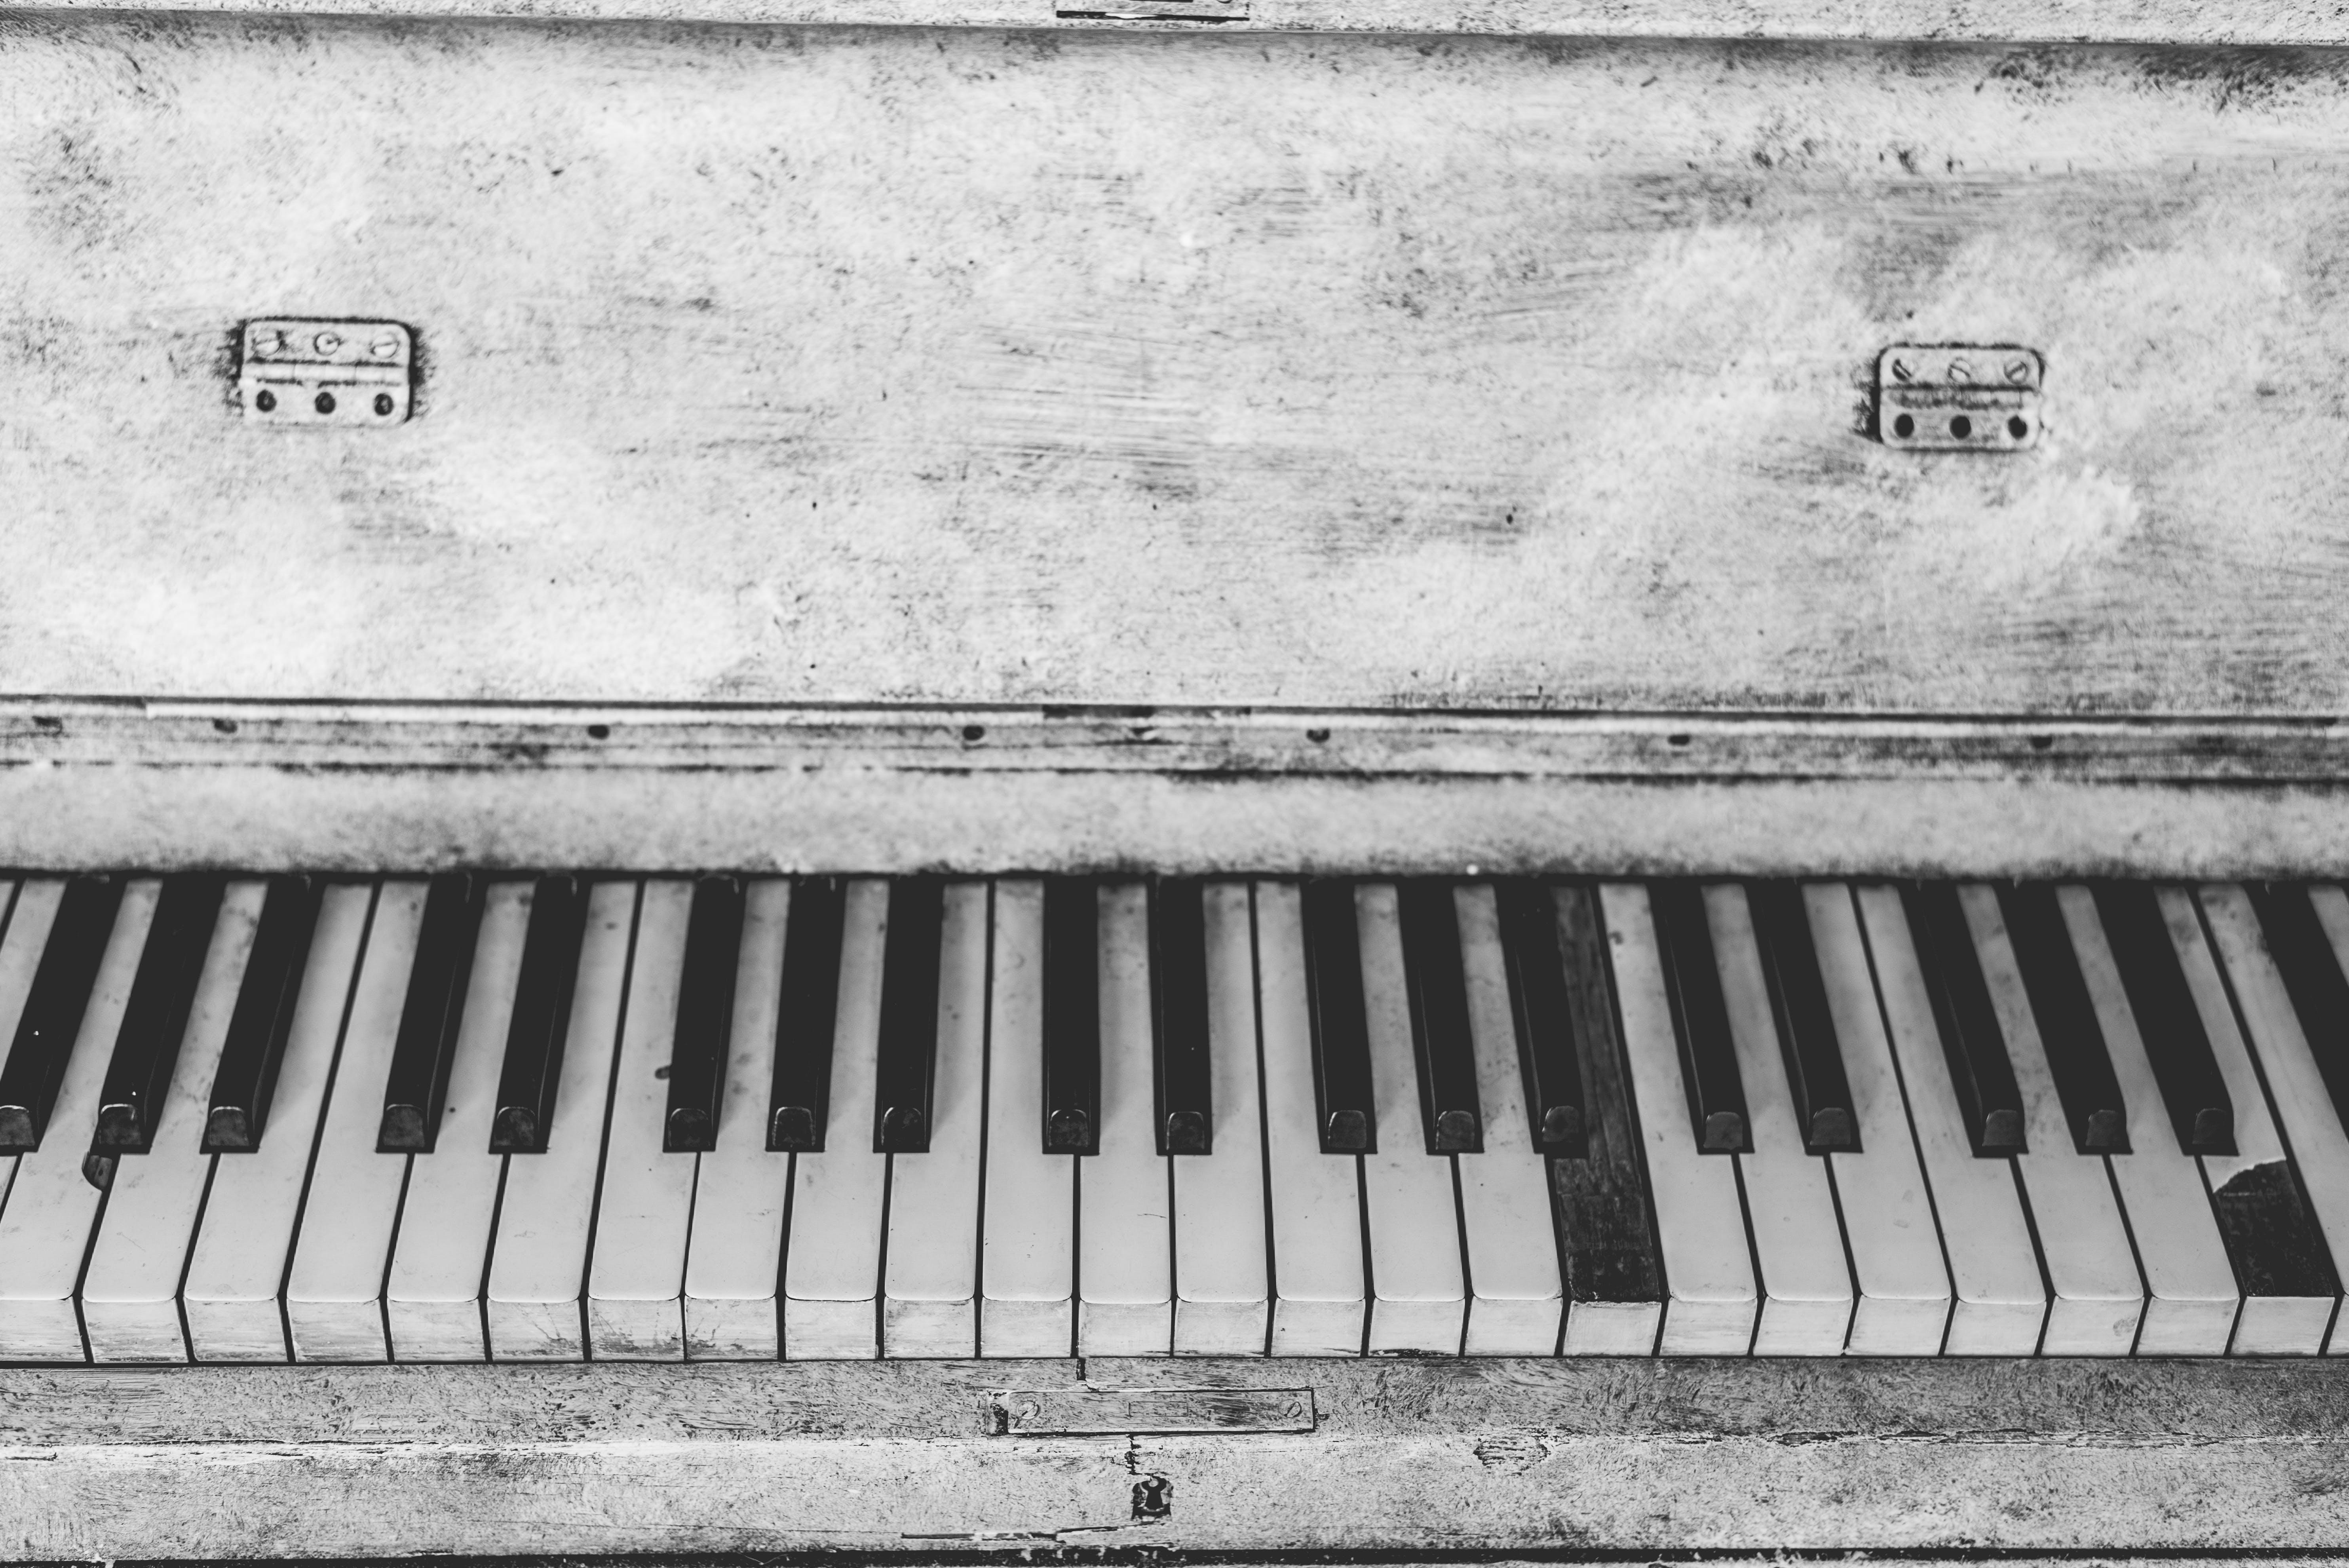 Black and White Upright Piano